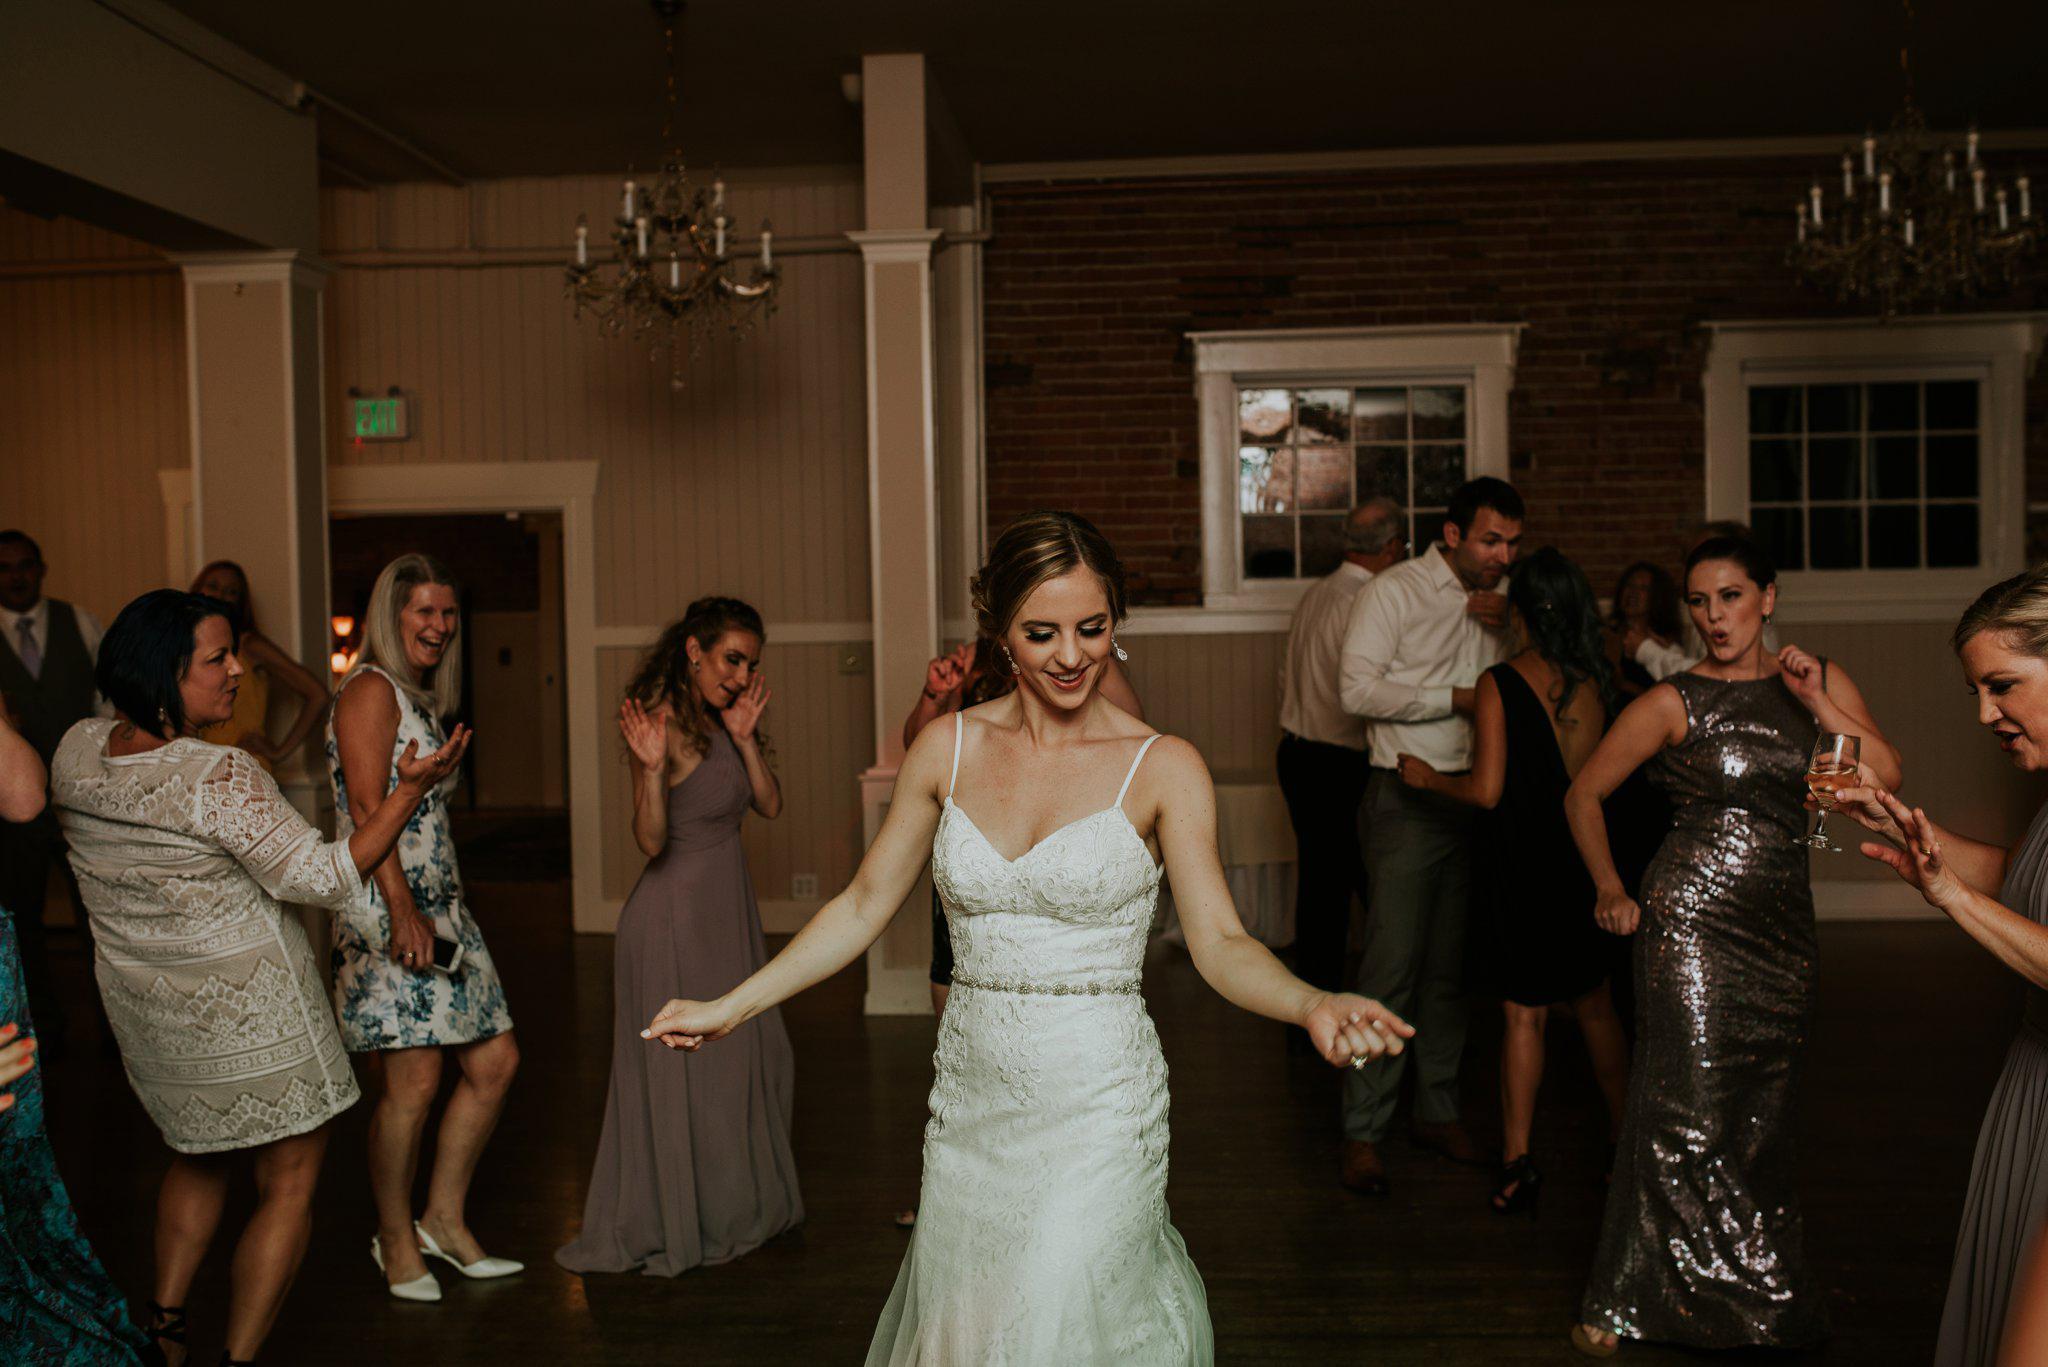 hollywood-school-house-wedding-seattle-photographer-caitlyn-nikula-124.jpg